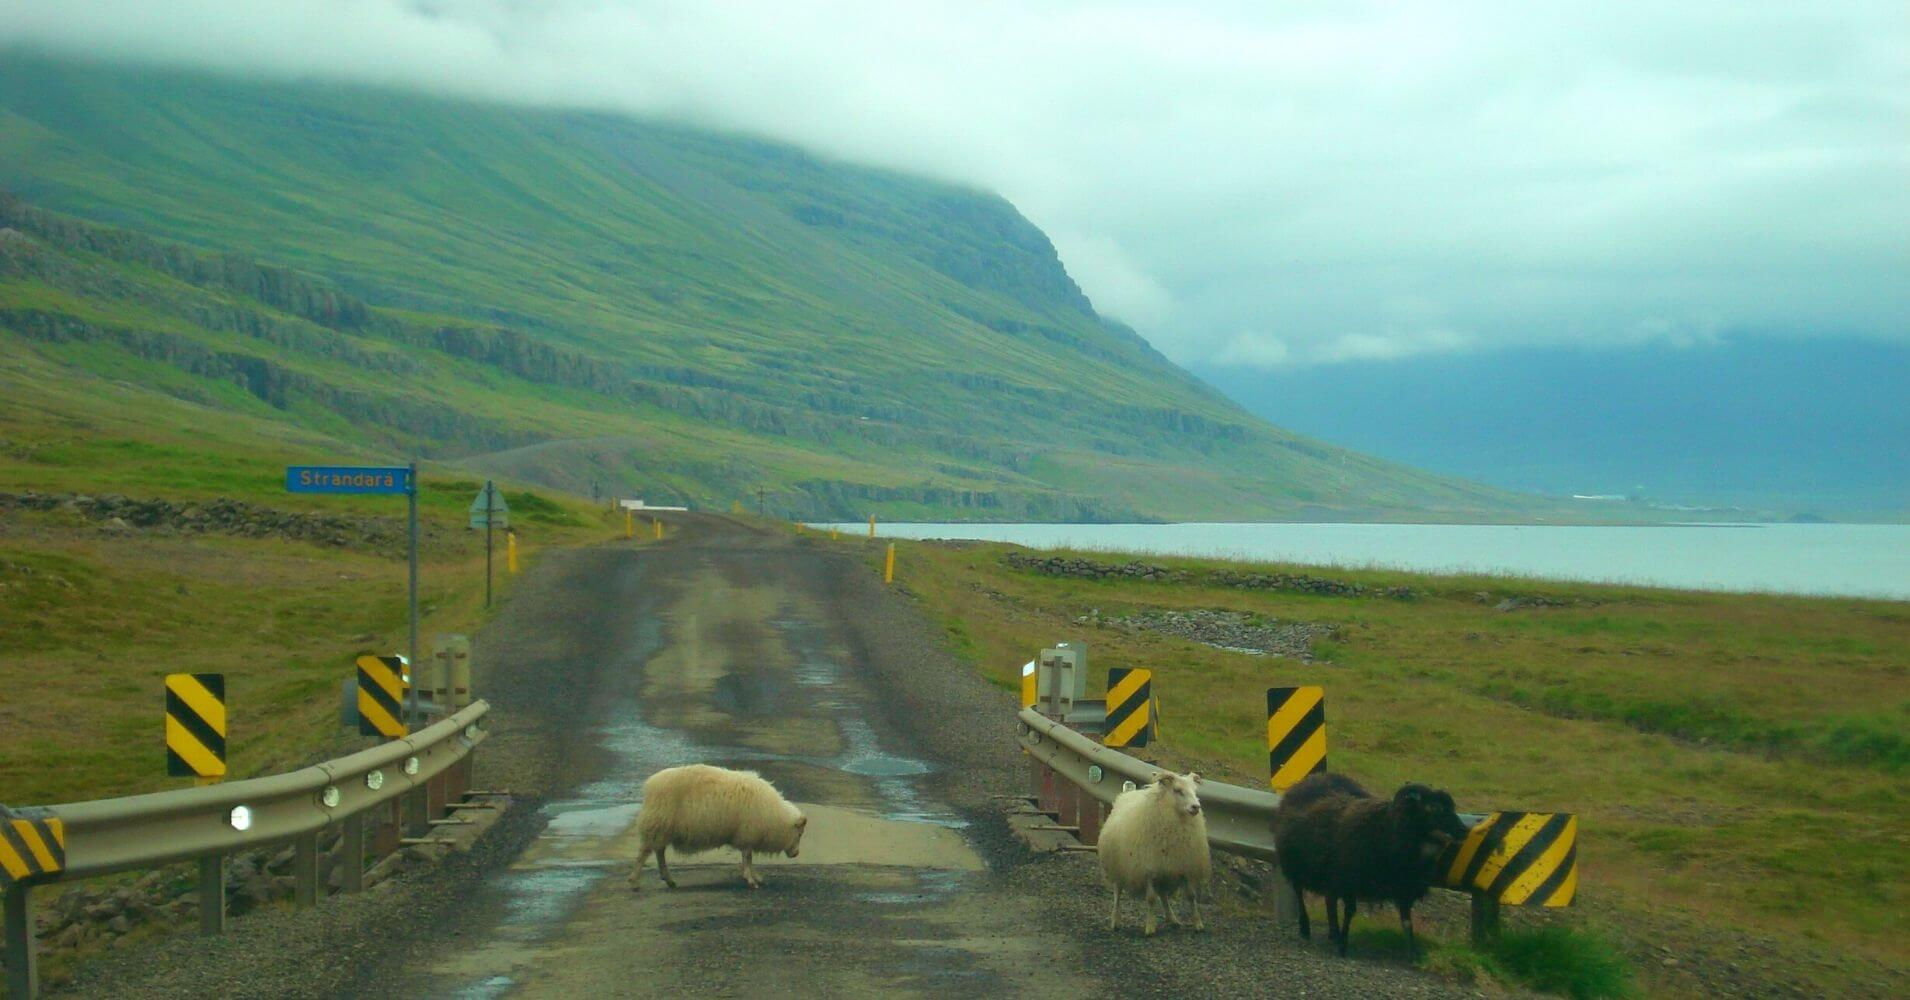 Ovejas de Hallormsstadur Este de Islandia.